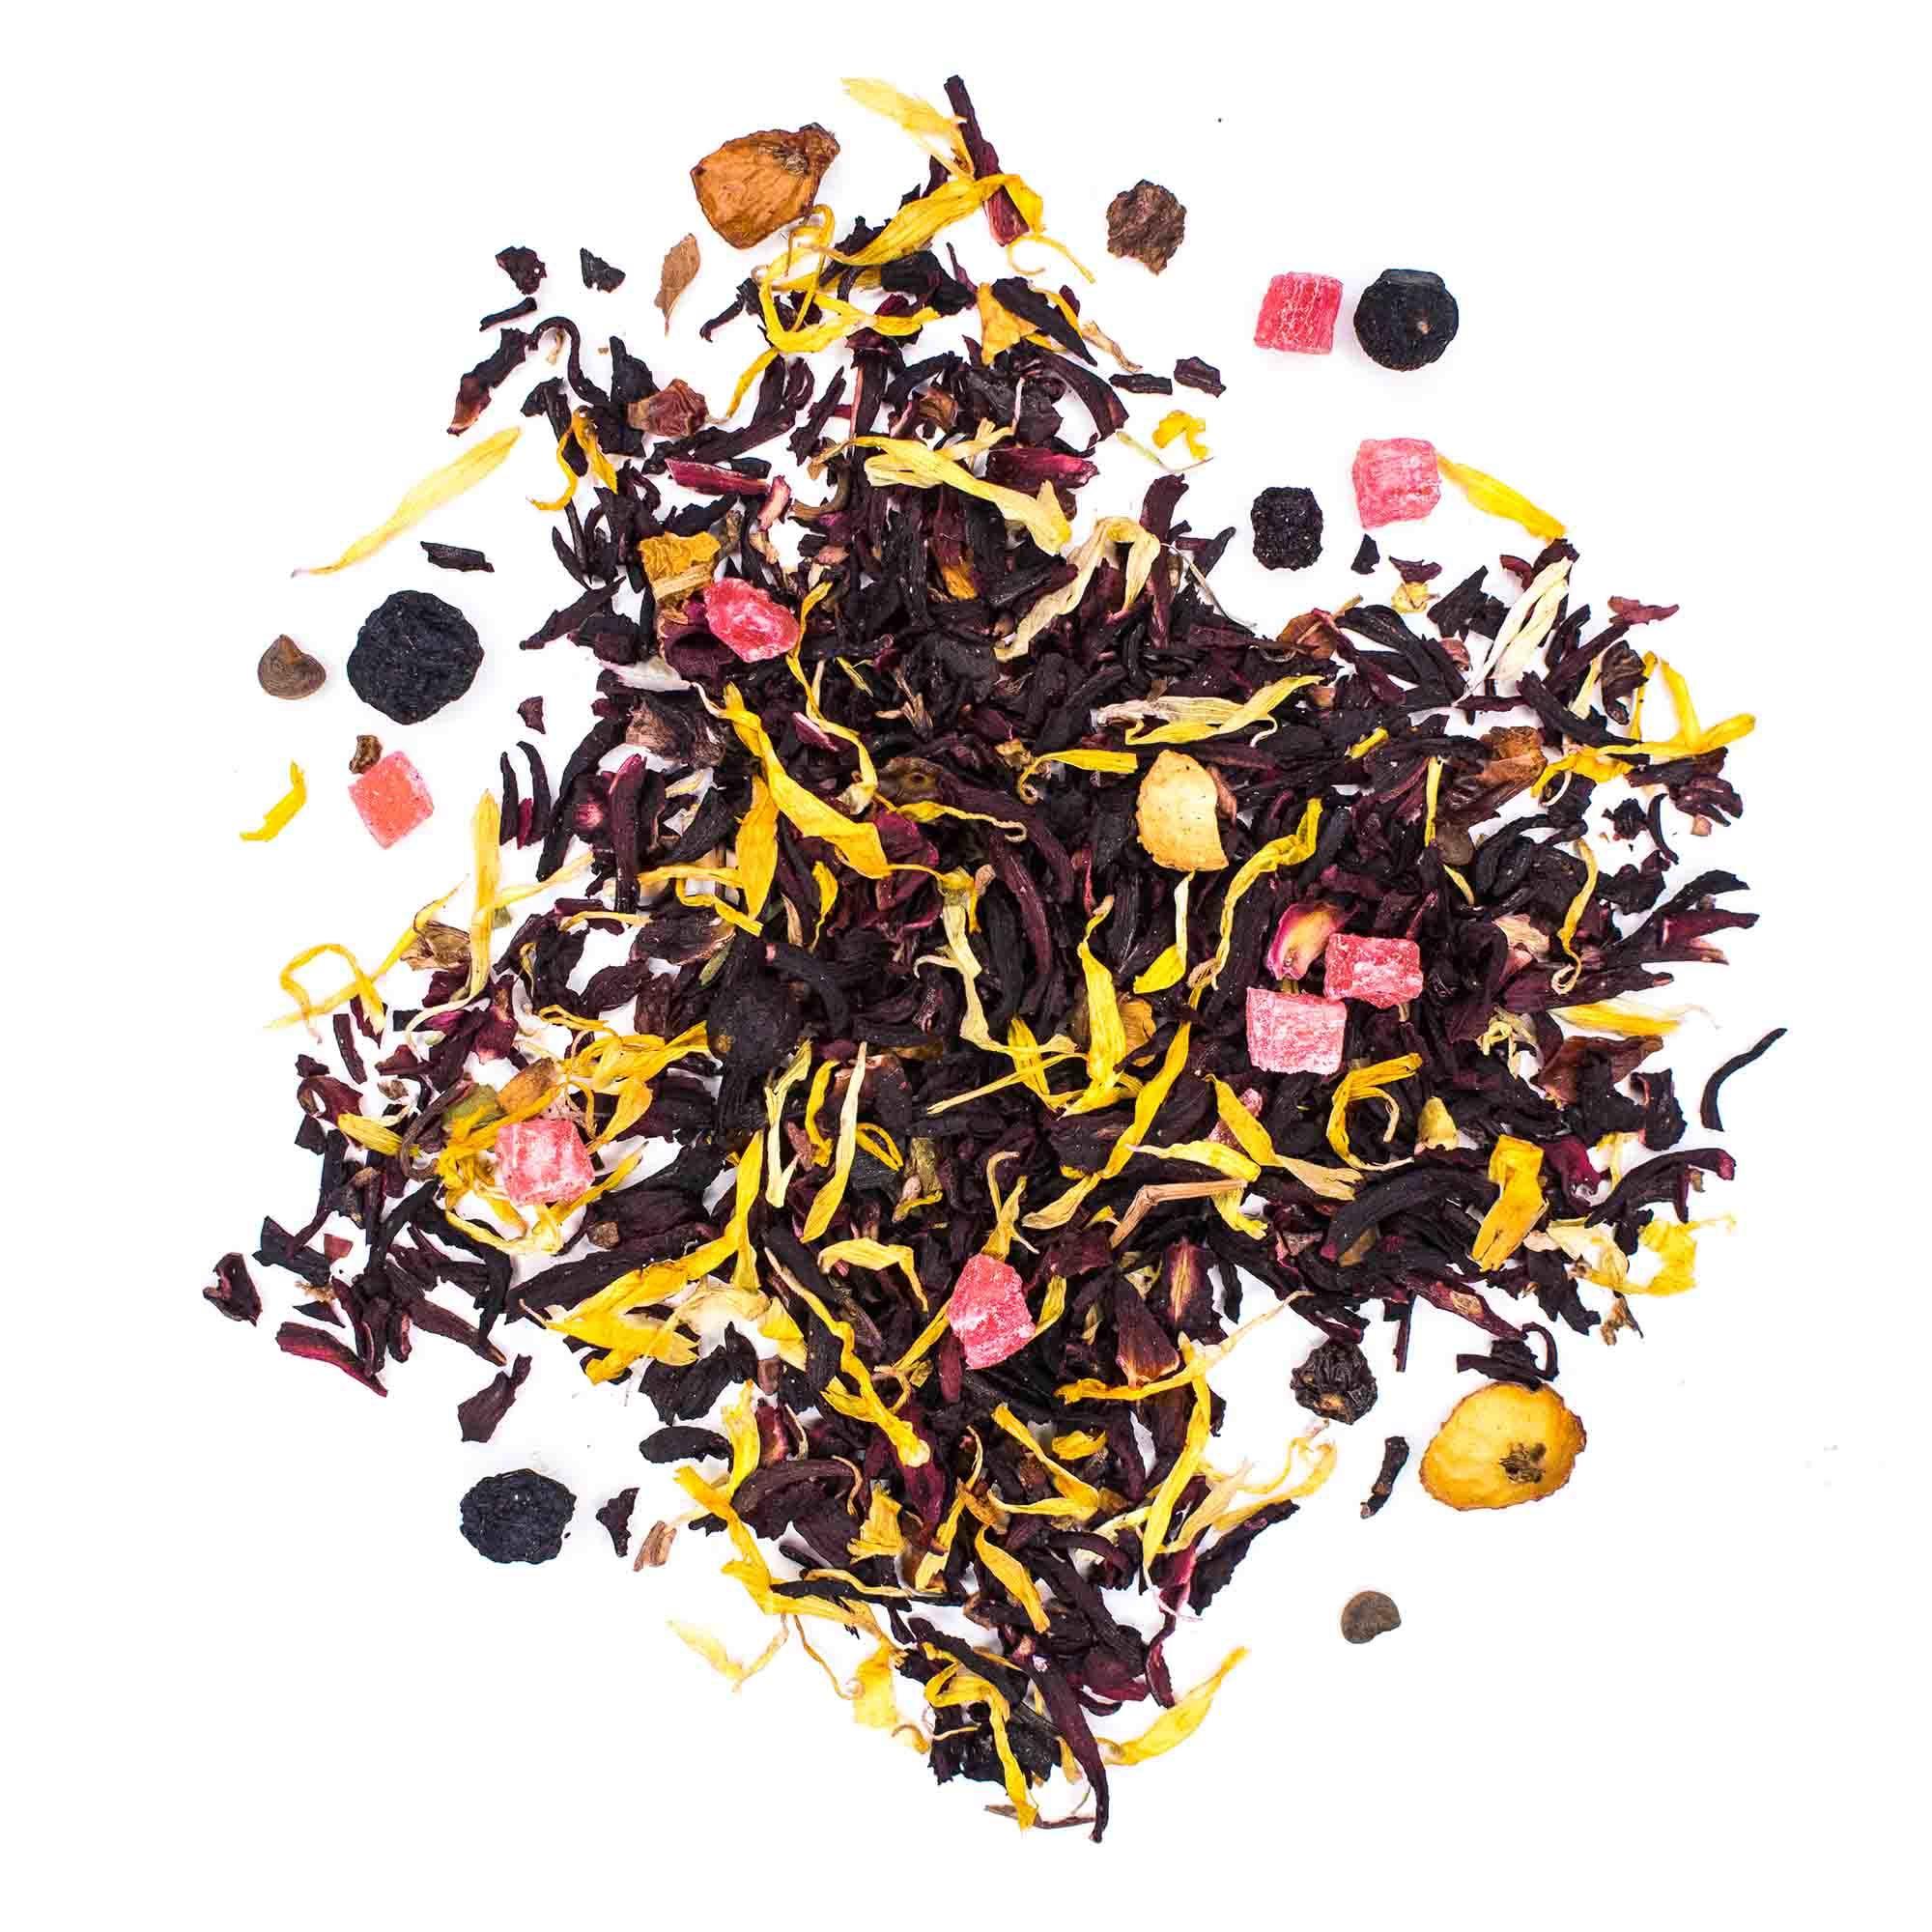 "Фруктовый, ягодный чай ""Арбузный пунш"" фруктовый чай 100гр chayarbuznuipynsh-taestar.jpg.jpg"